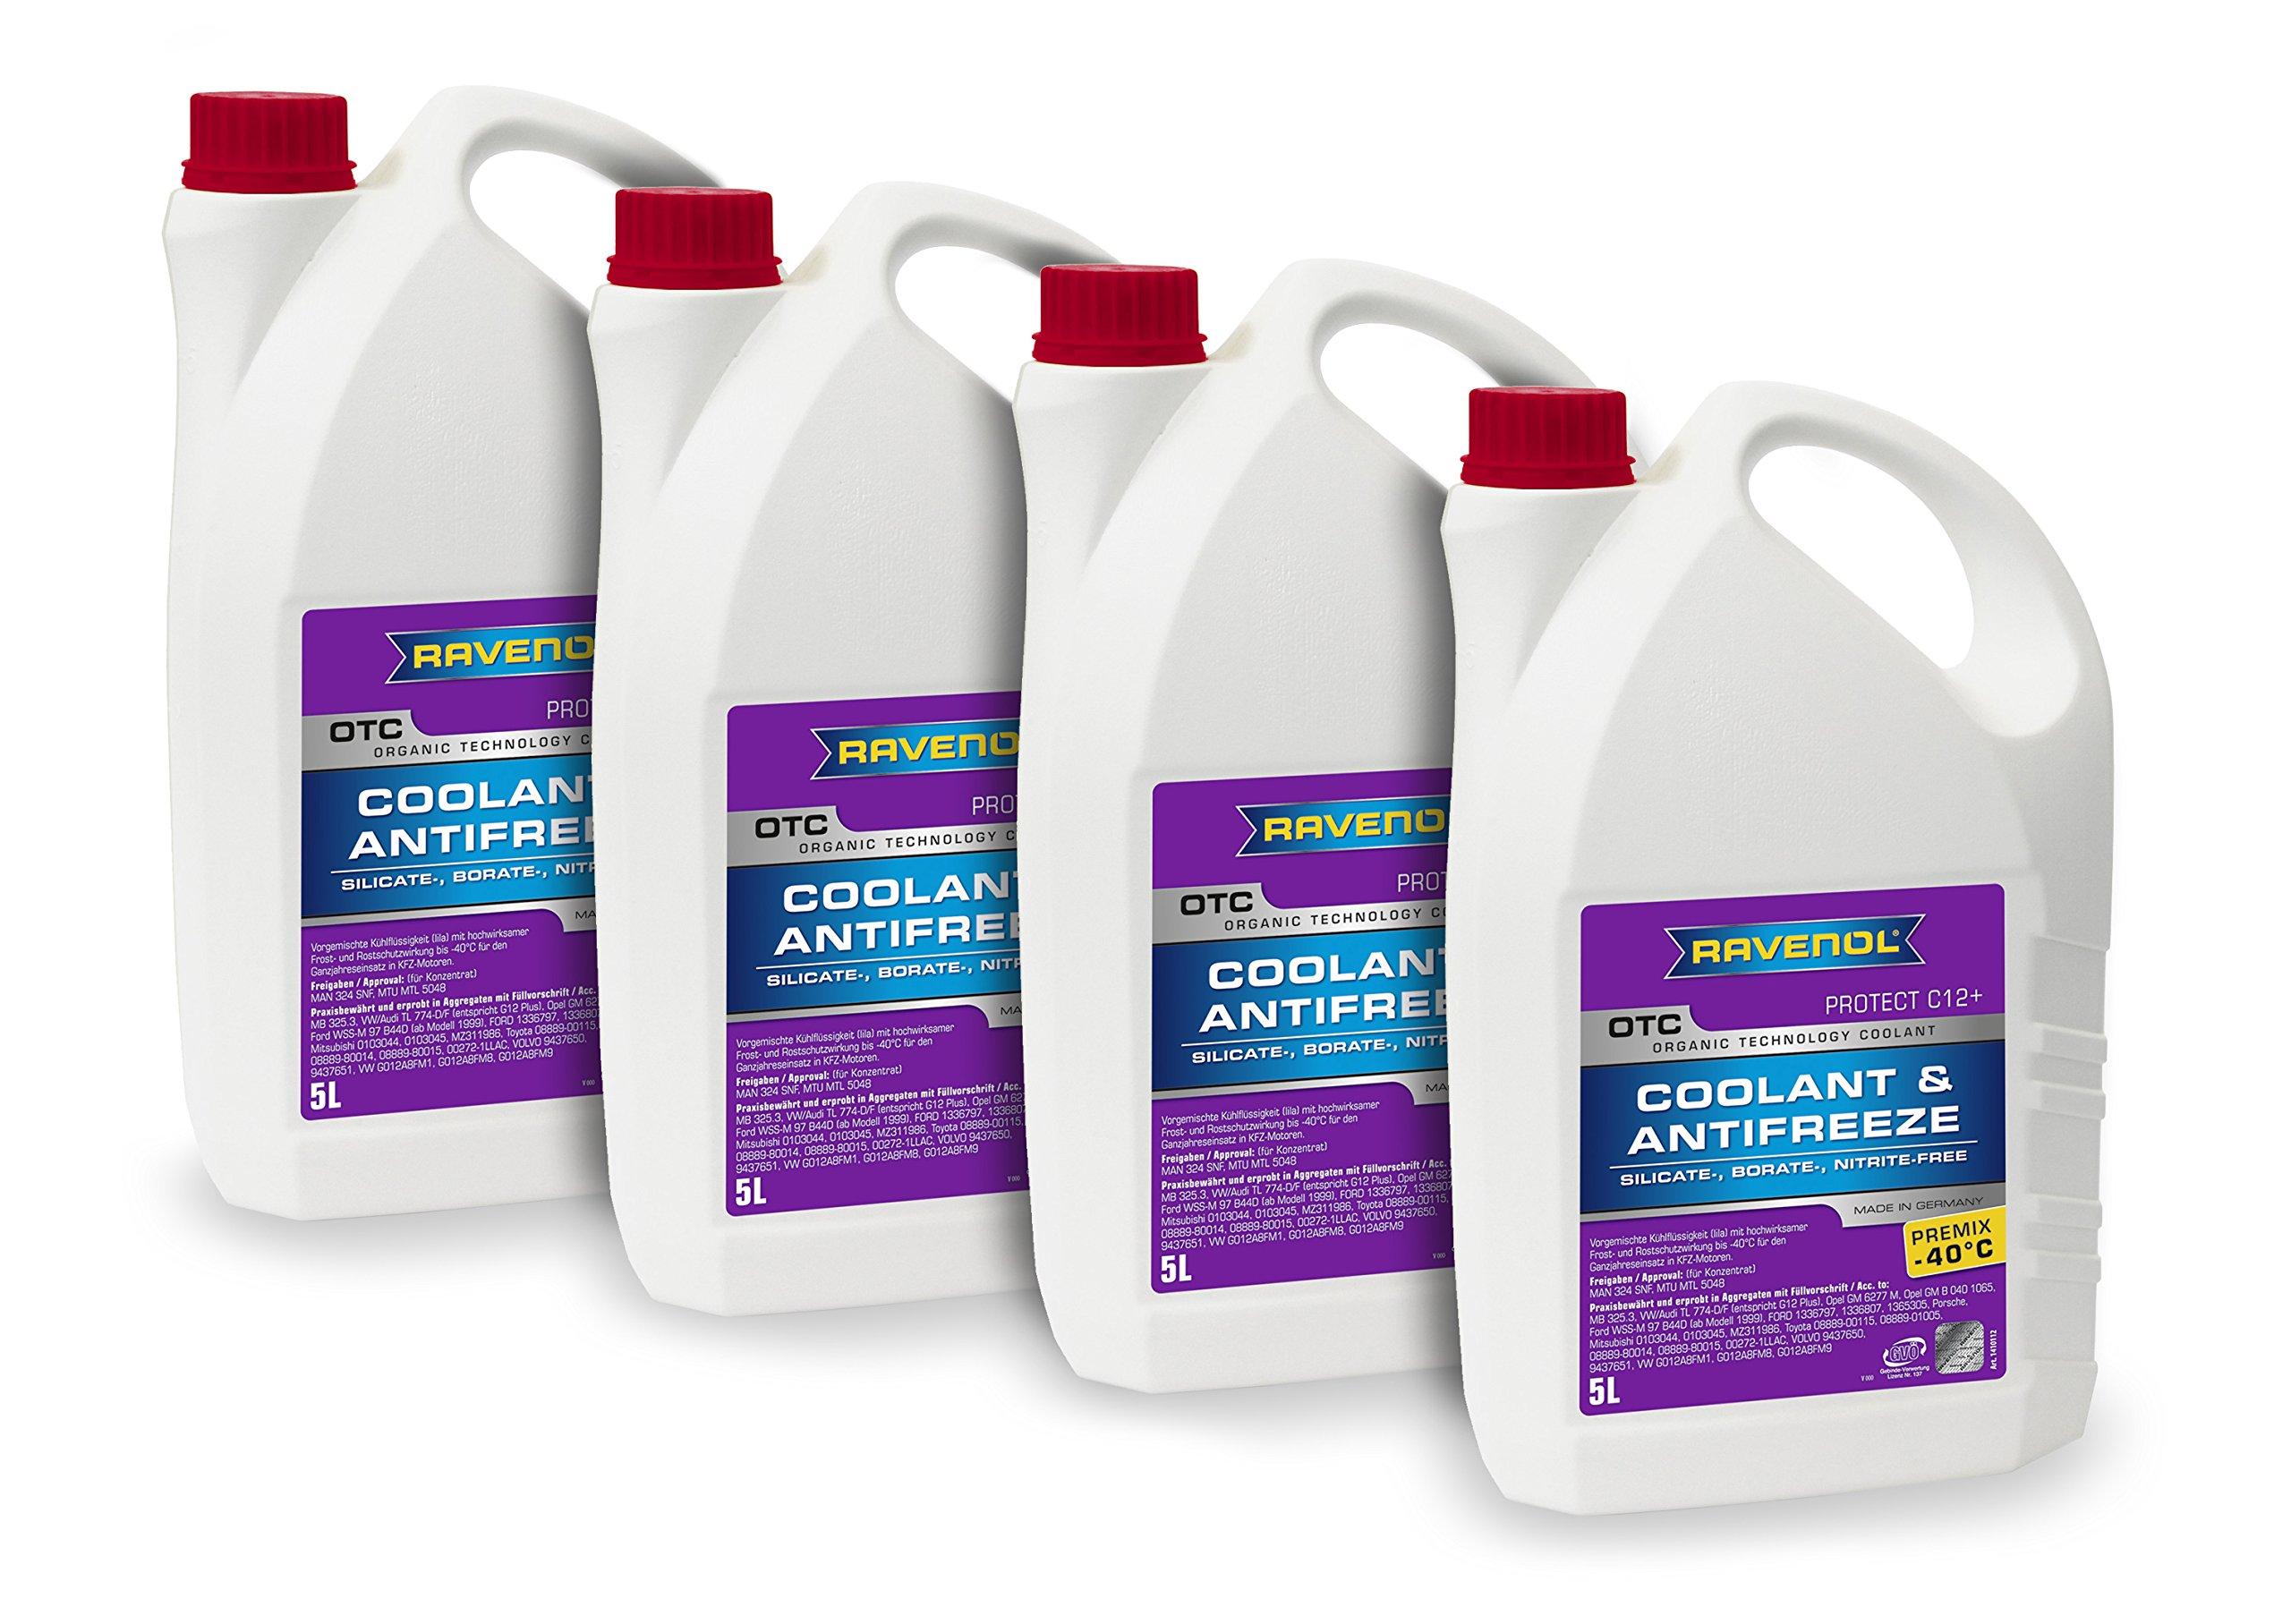 Ravenol J4D2001-1-04 Coolant Antifreeze - OTC C12+ Premix VW TL 774 F (G12 Plus) (5L, Case of 4)